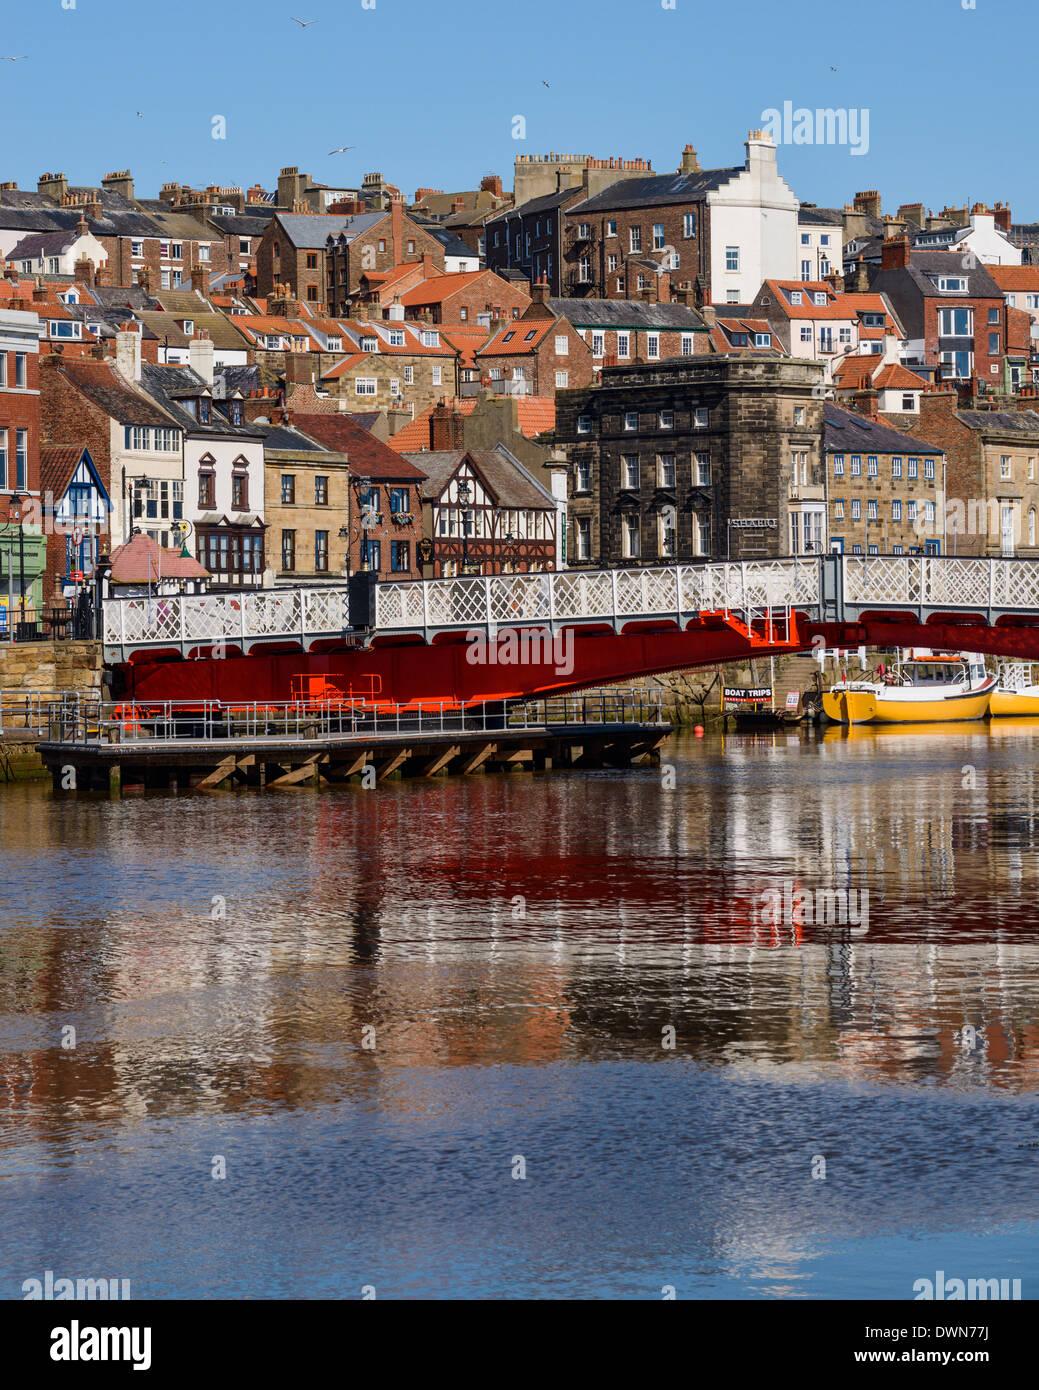 The swing bridge on the River Esk, Whitby, North Yorkshire, Yorkshire, England, United Kingdom, Europe - Stock Image